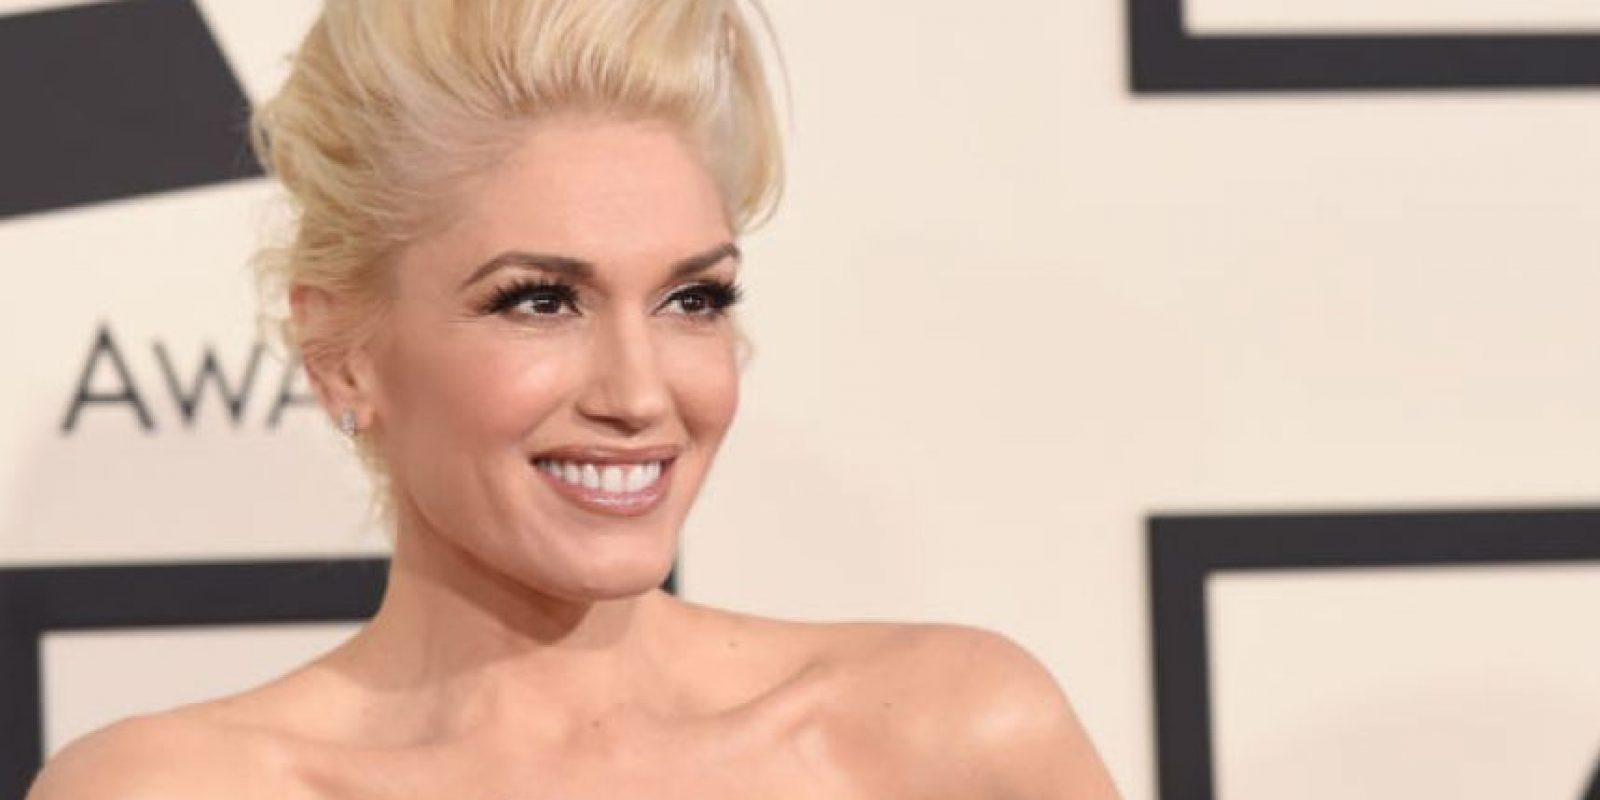 Gwen Stefani no siempre lució así. Foto:vía Getty Images